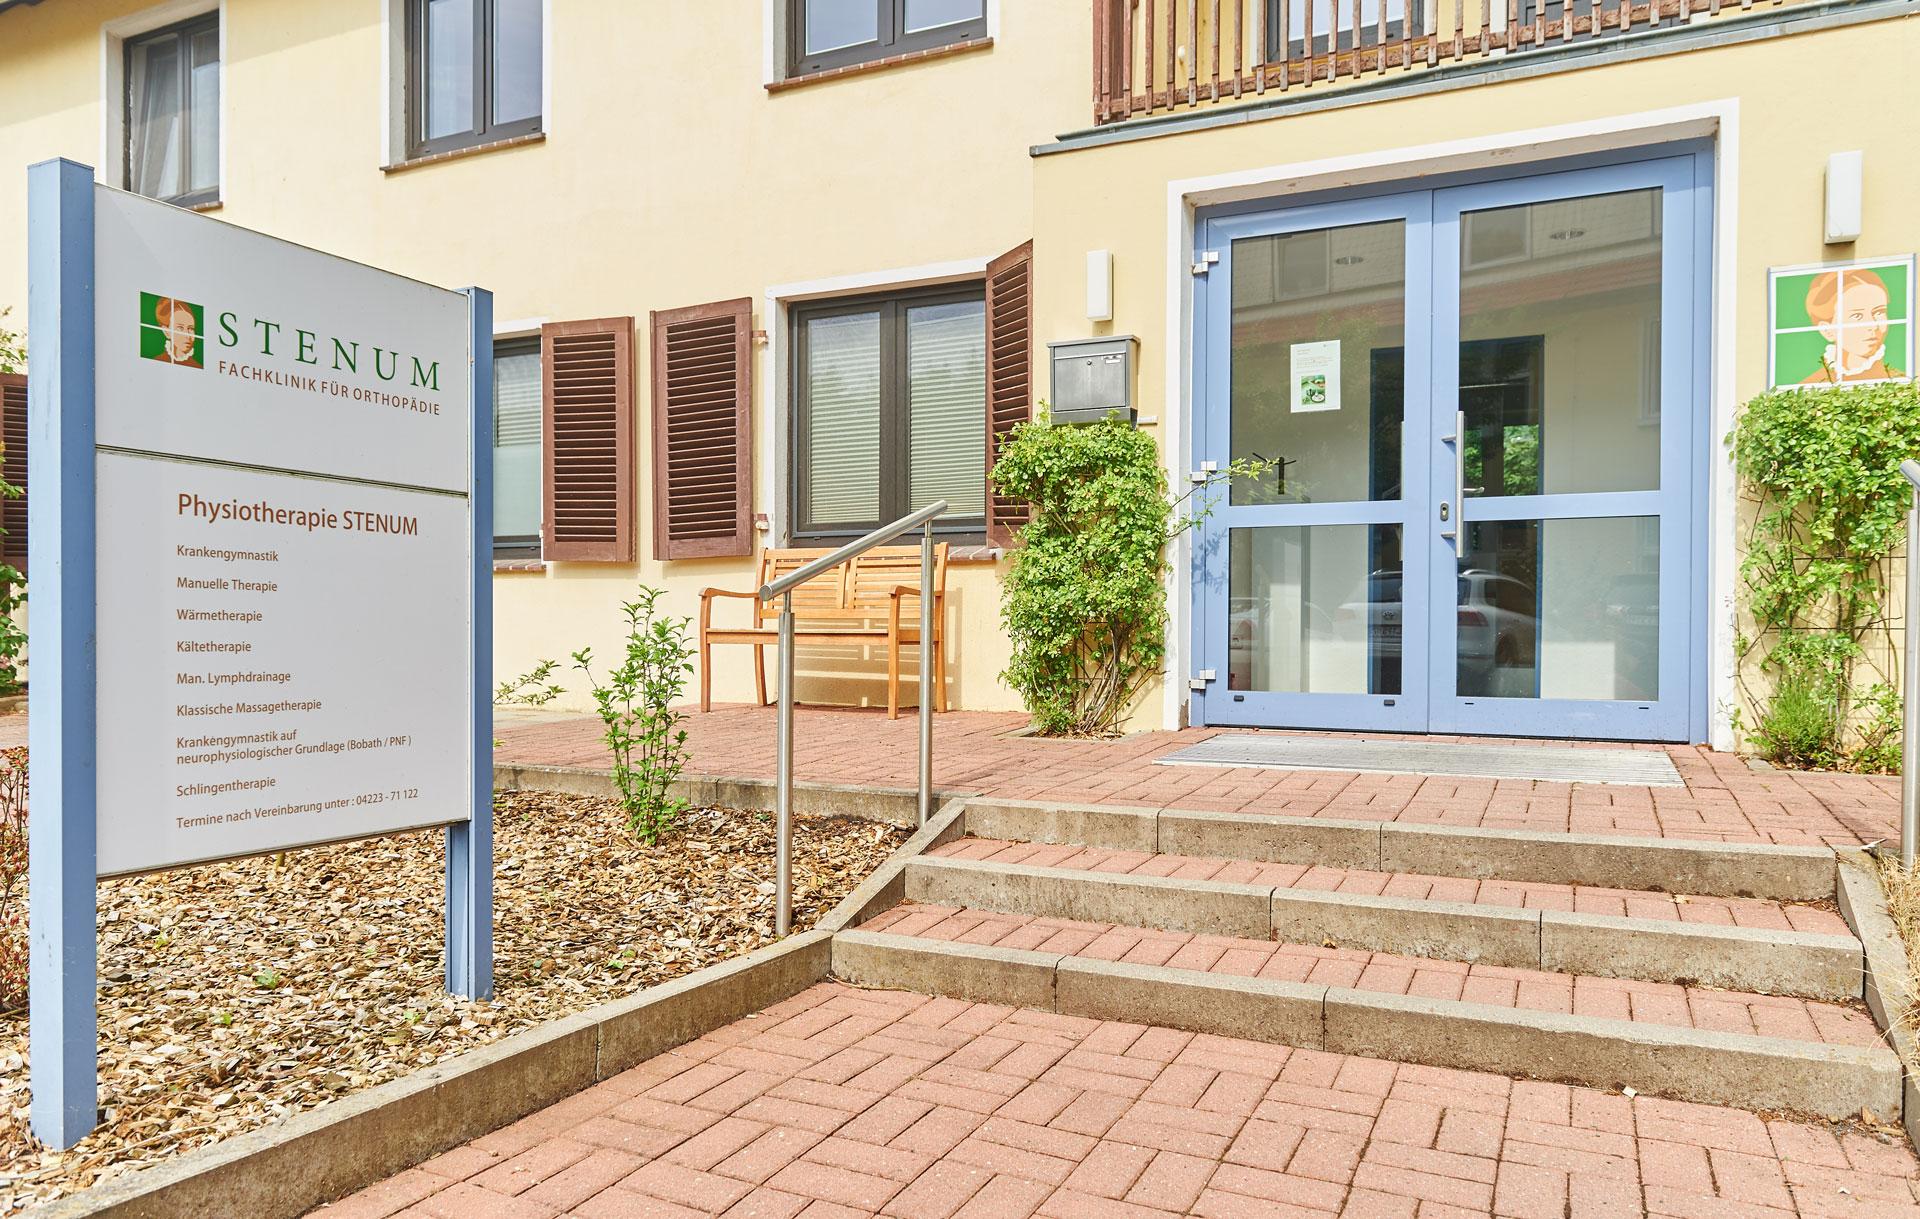 Physiotherapie Eingang - STENUM Fachklinik